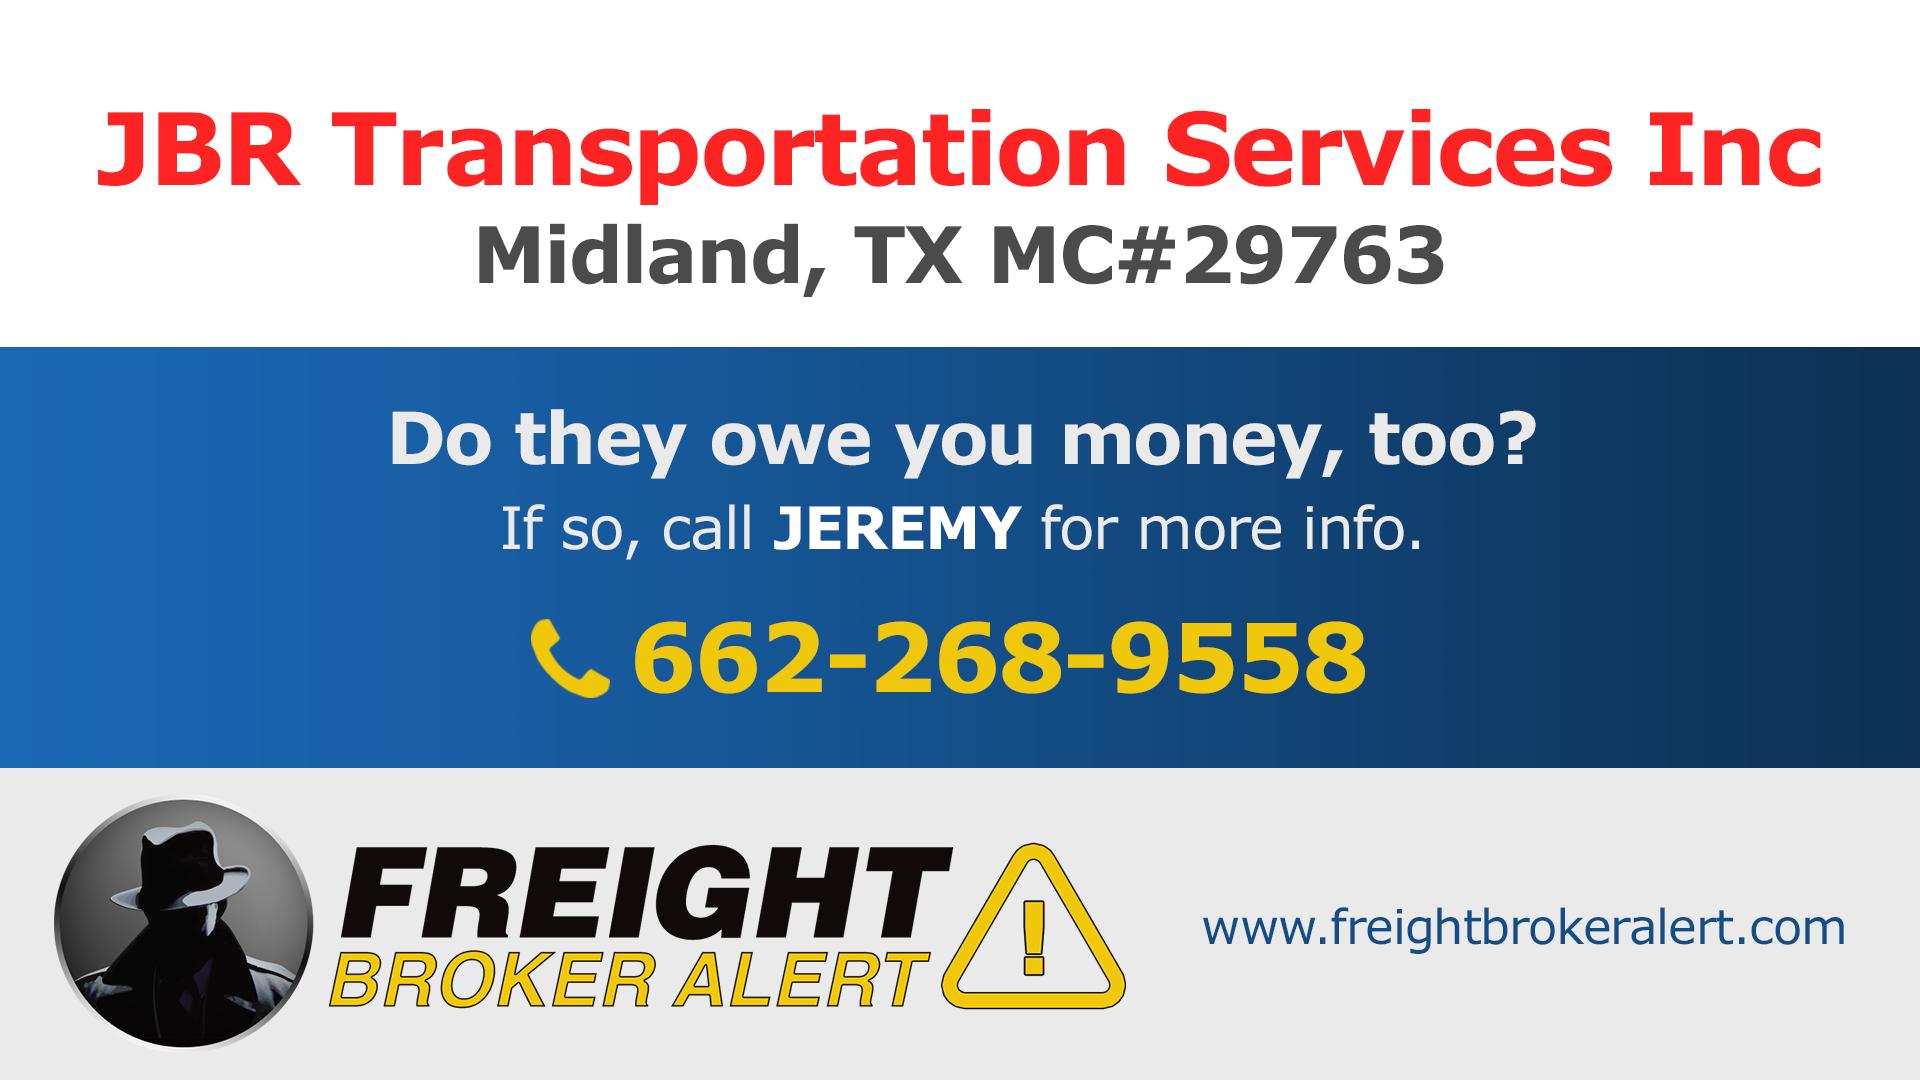 JBR Transportation Services Inc Texas